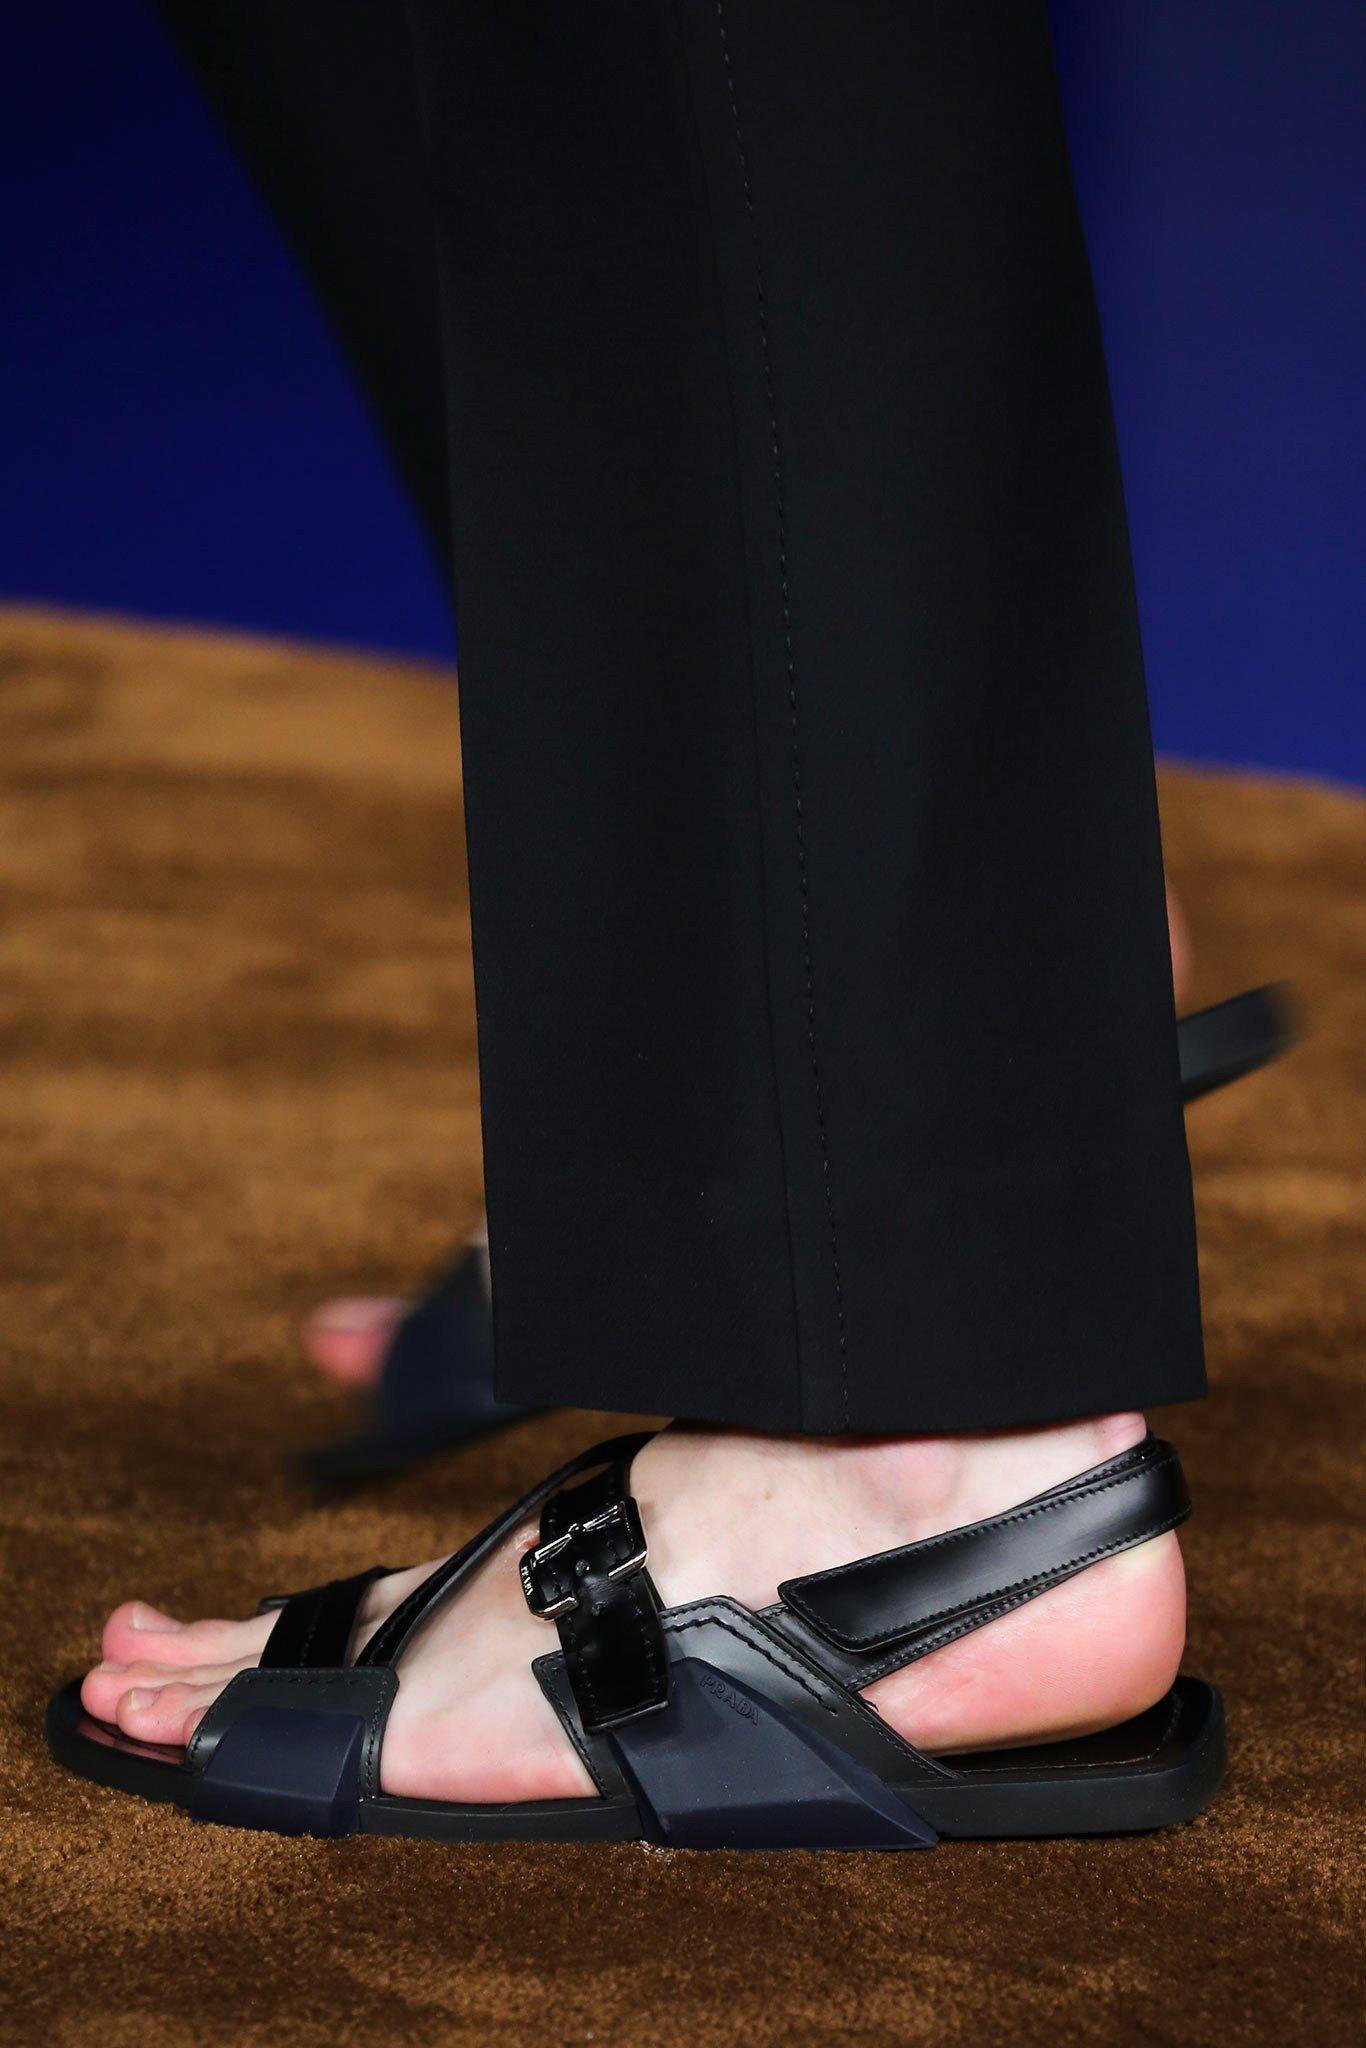 Sandals with Feathers Applied Spring/summerPrada PHOlZTFHx